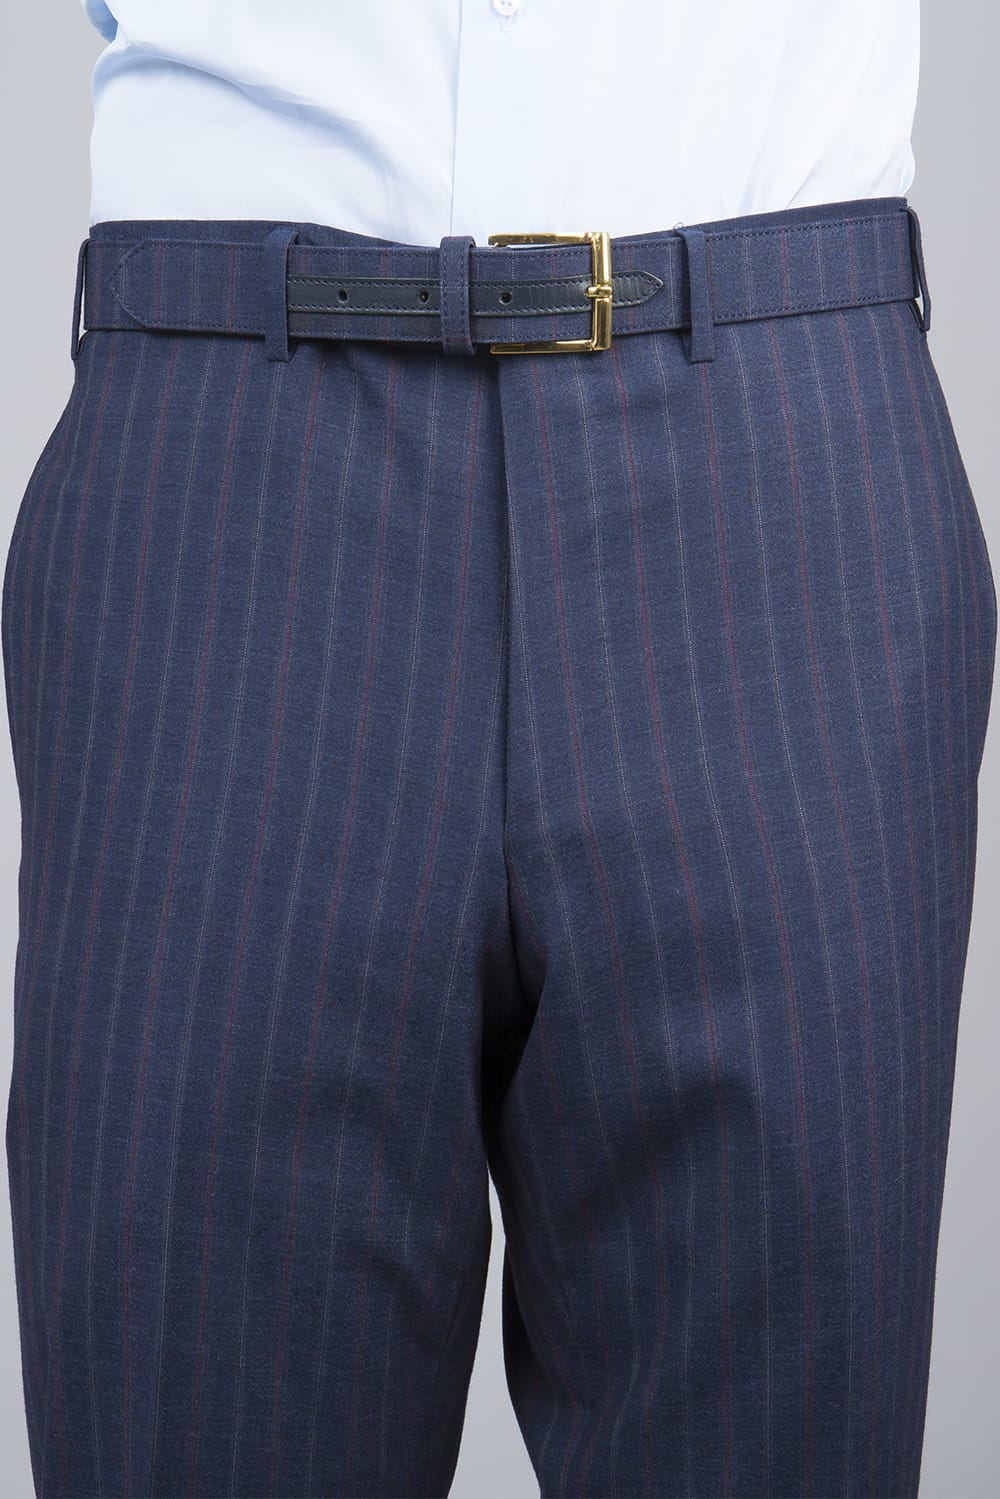 HP0 – Pantalon